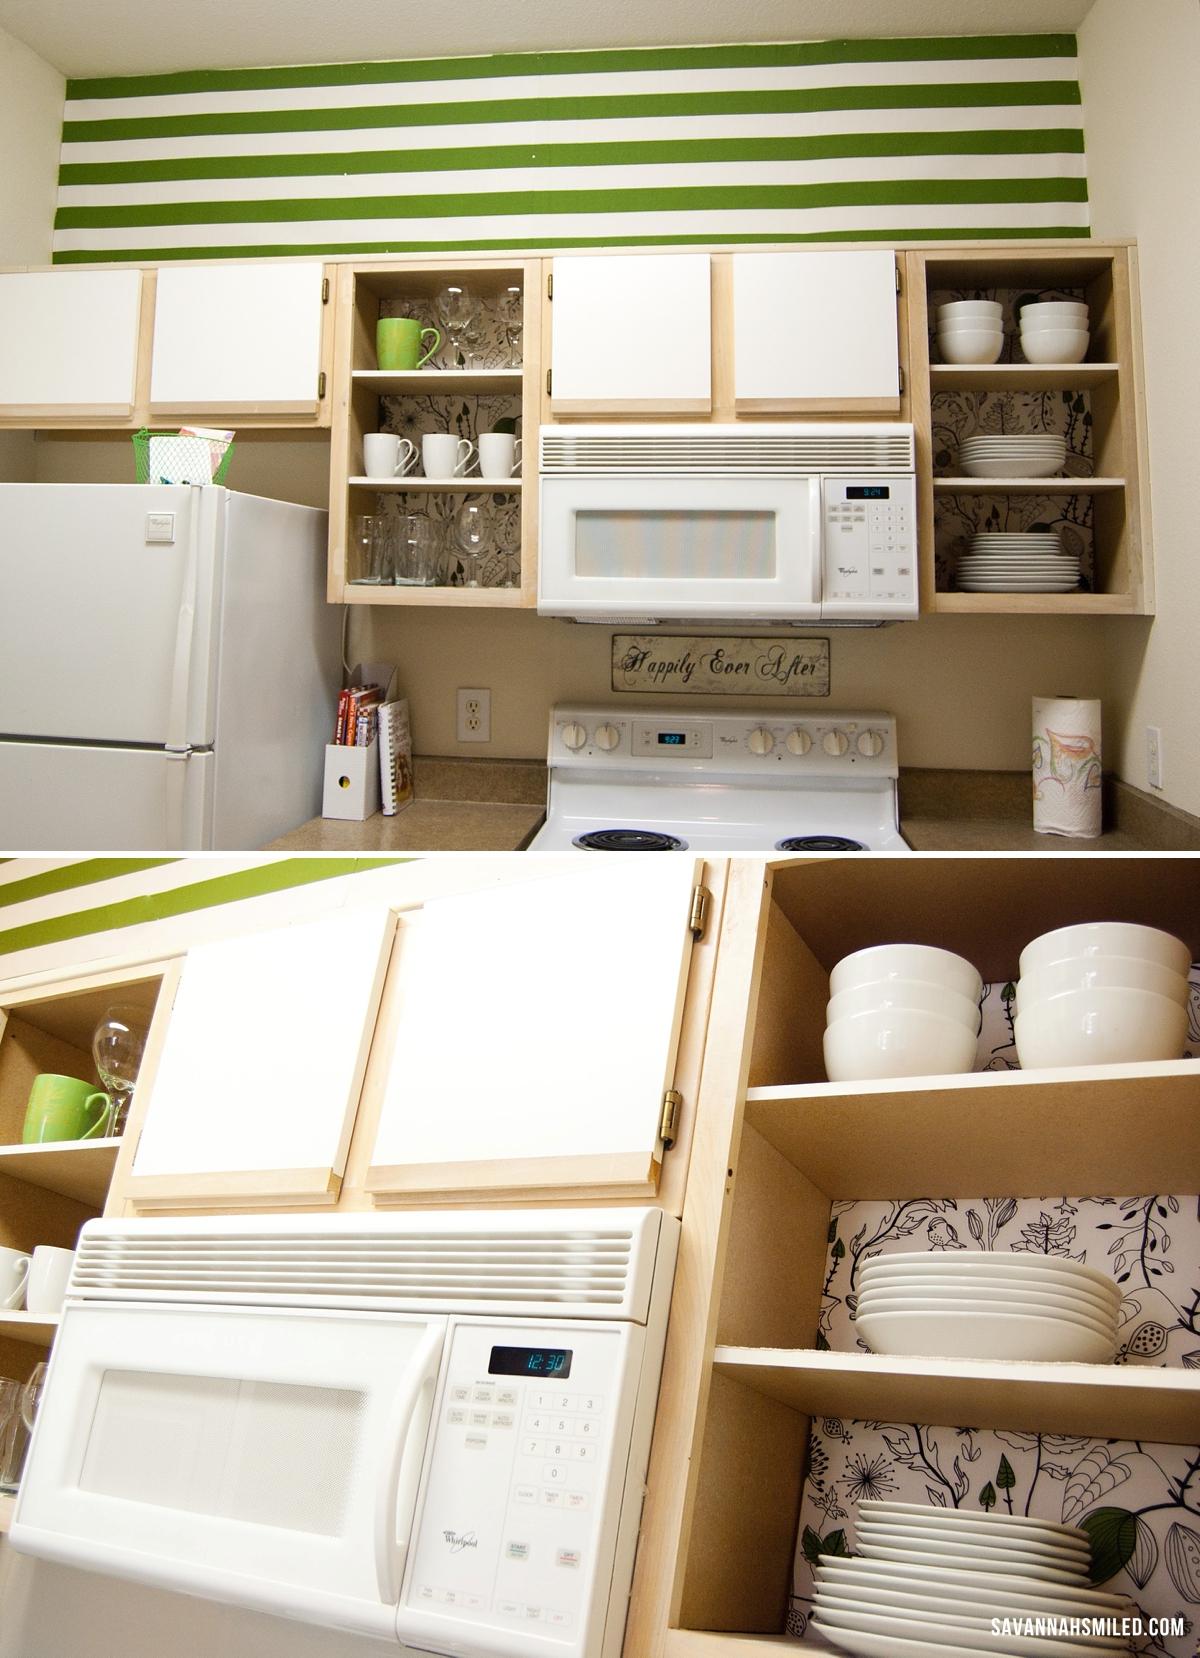 rent-kitchen-apartment-diy-fabric